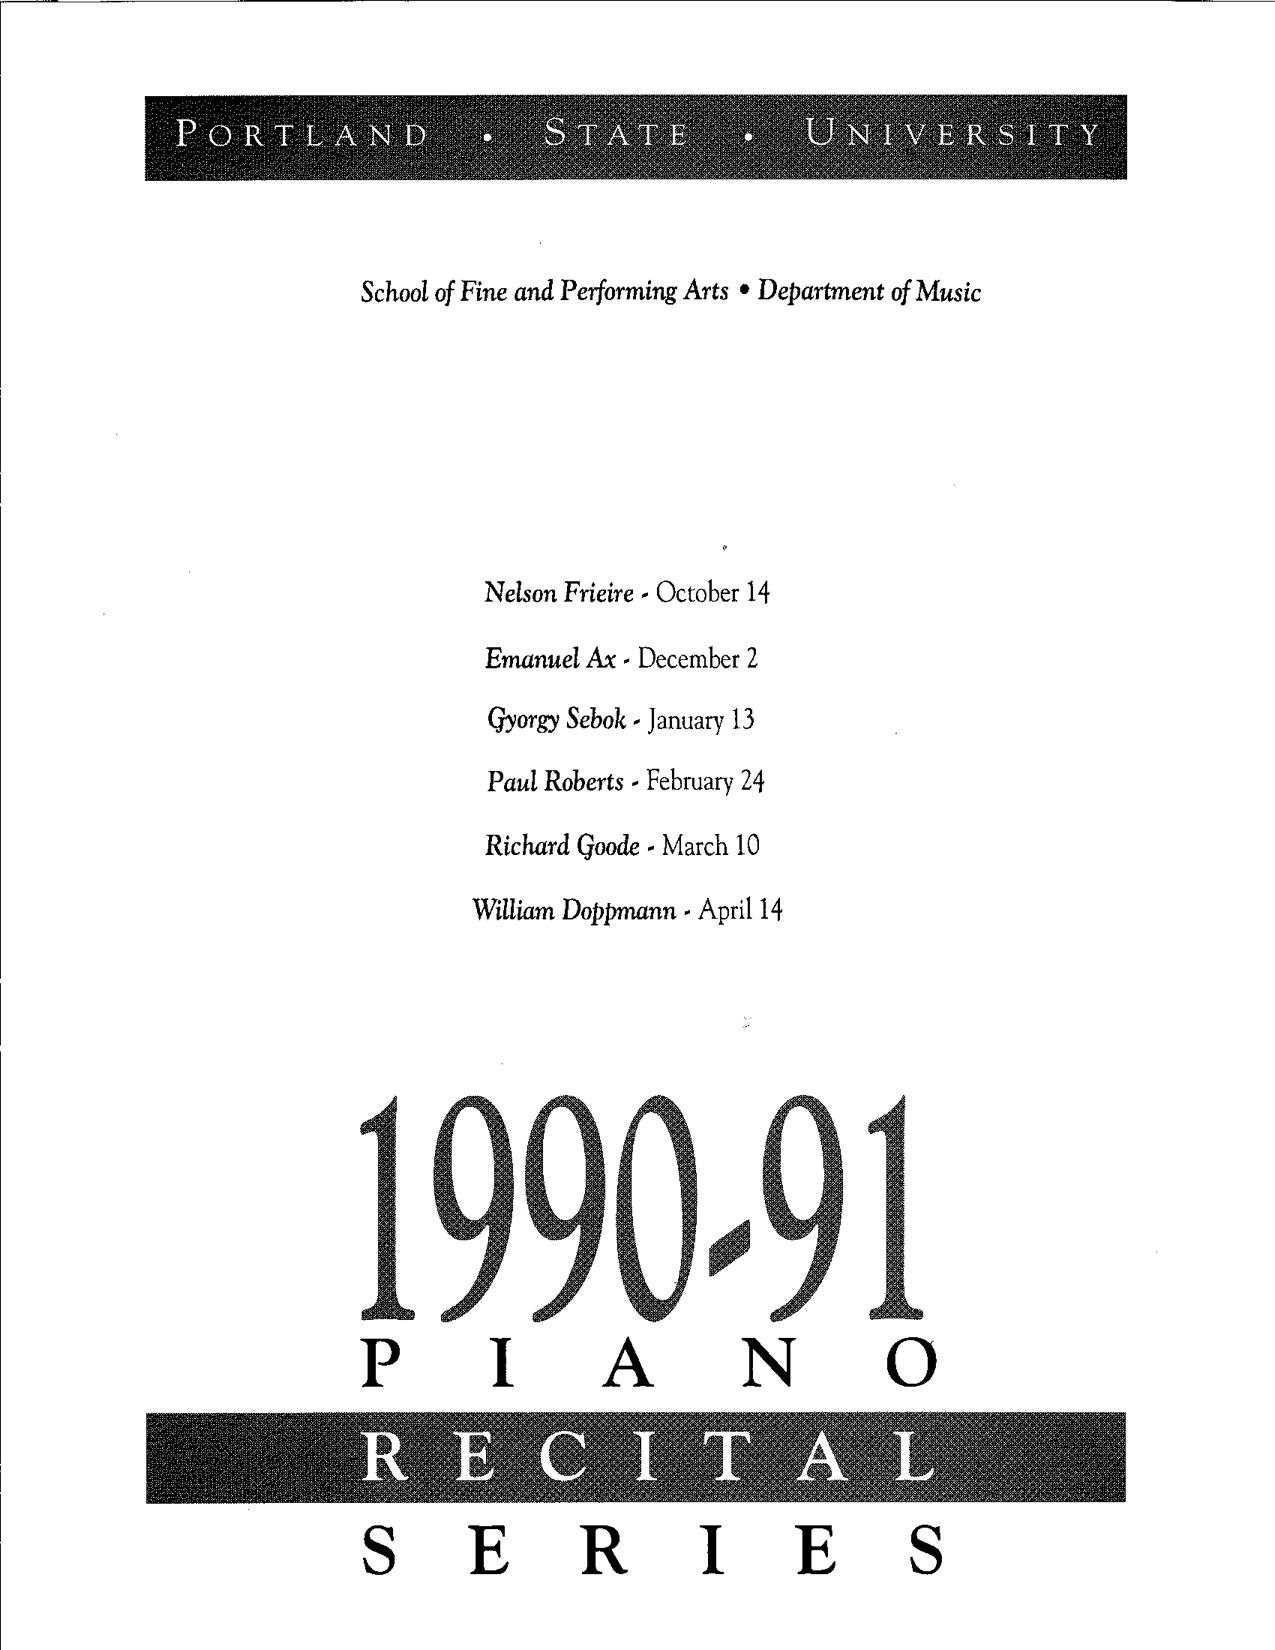 Doppmann90-91_Program.jpg